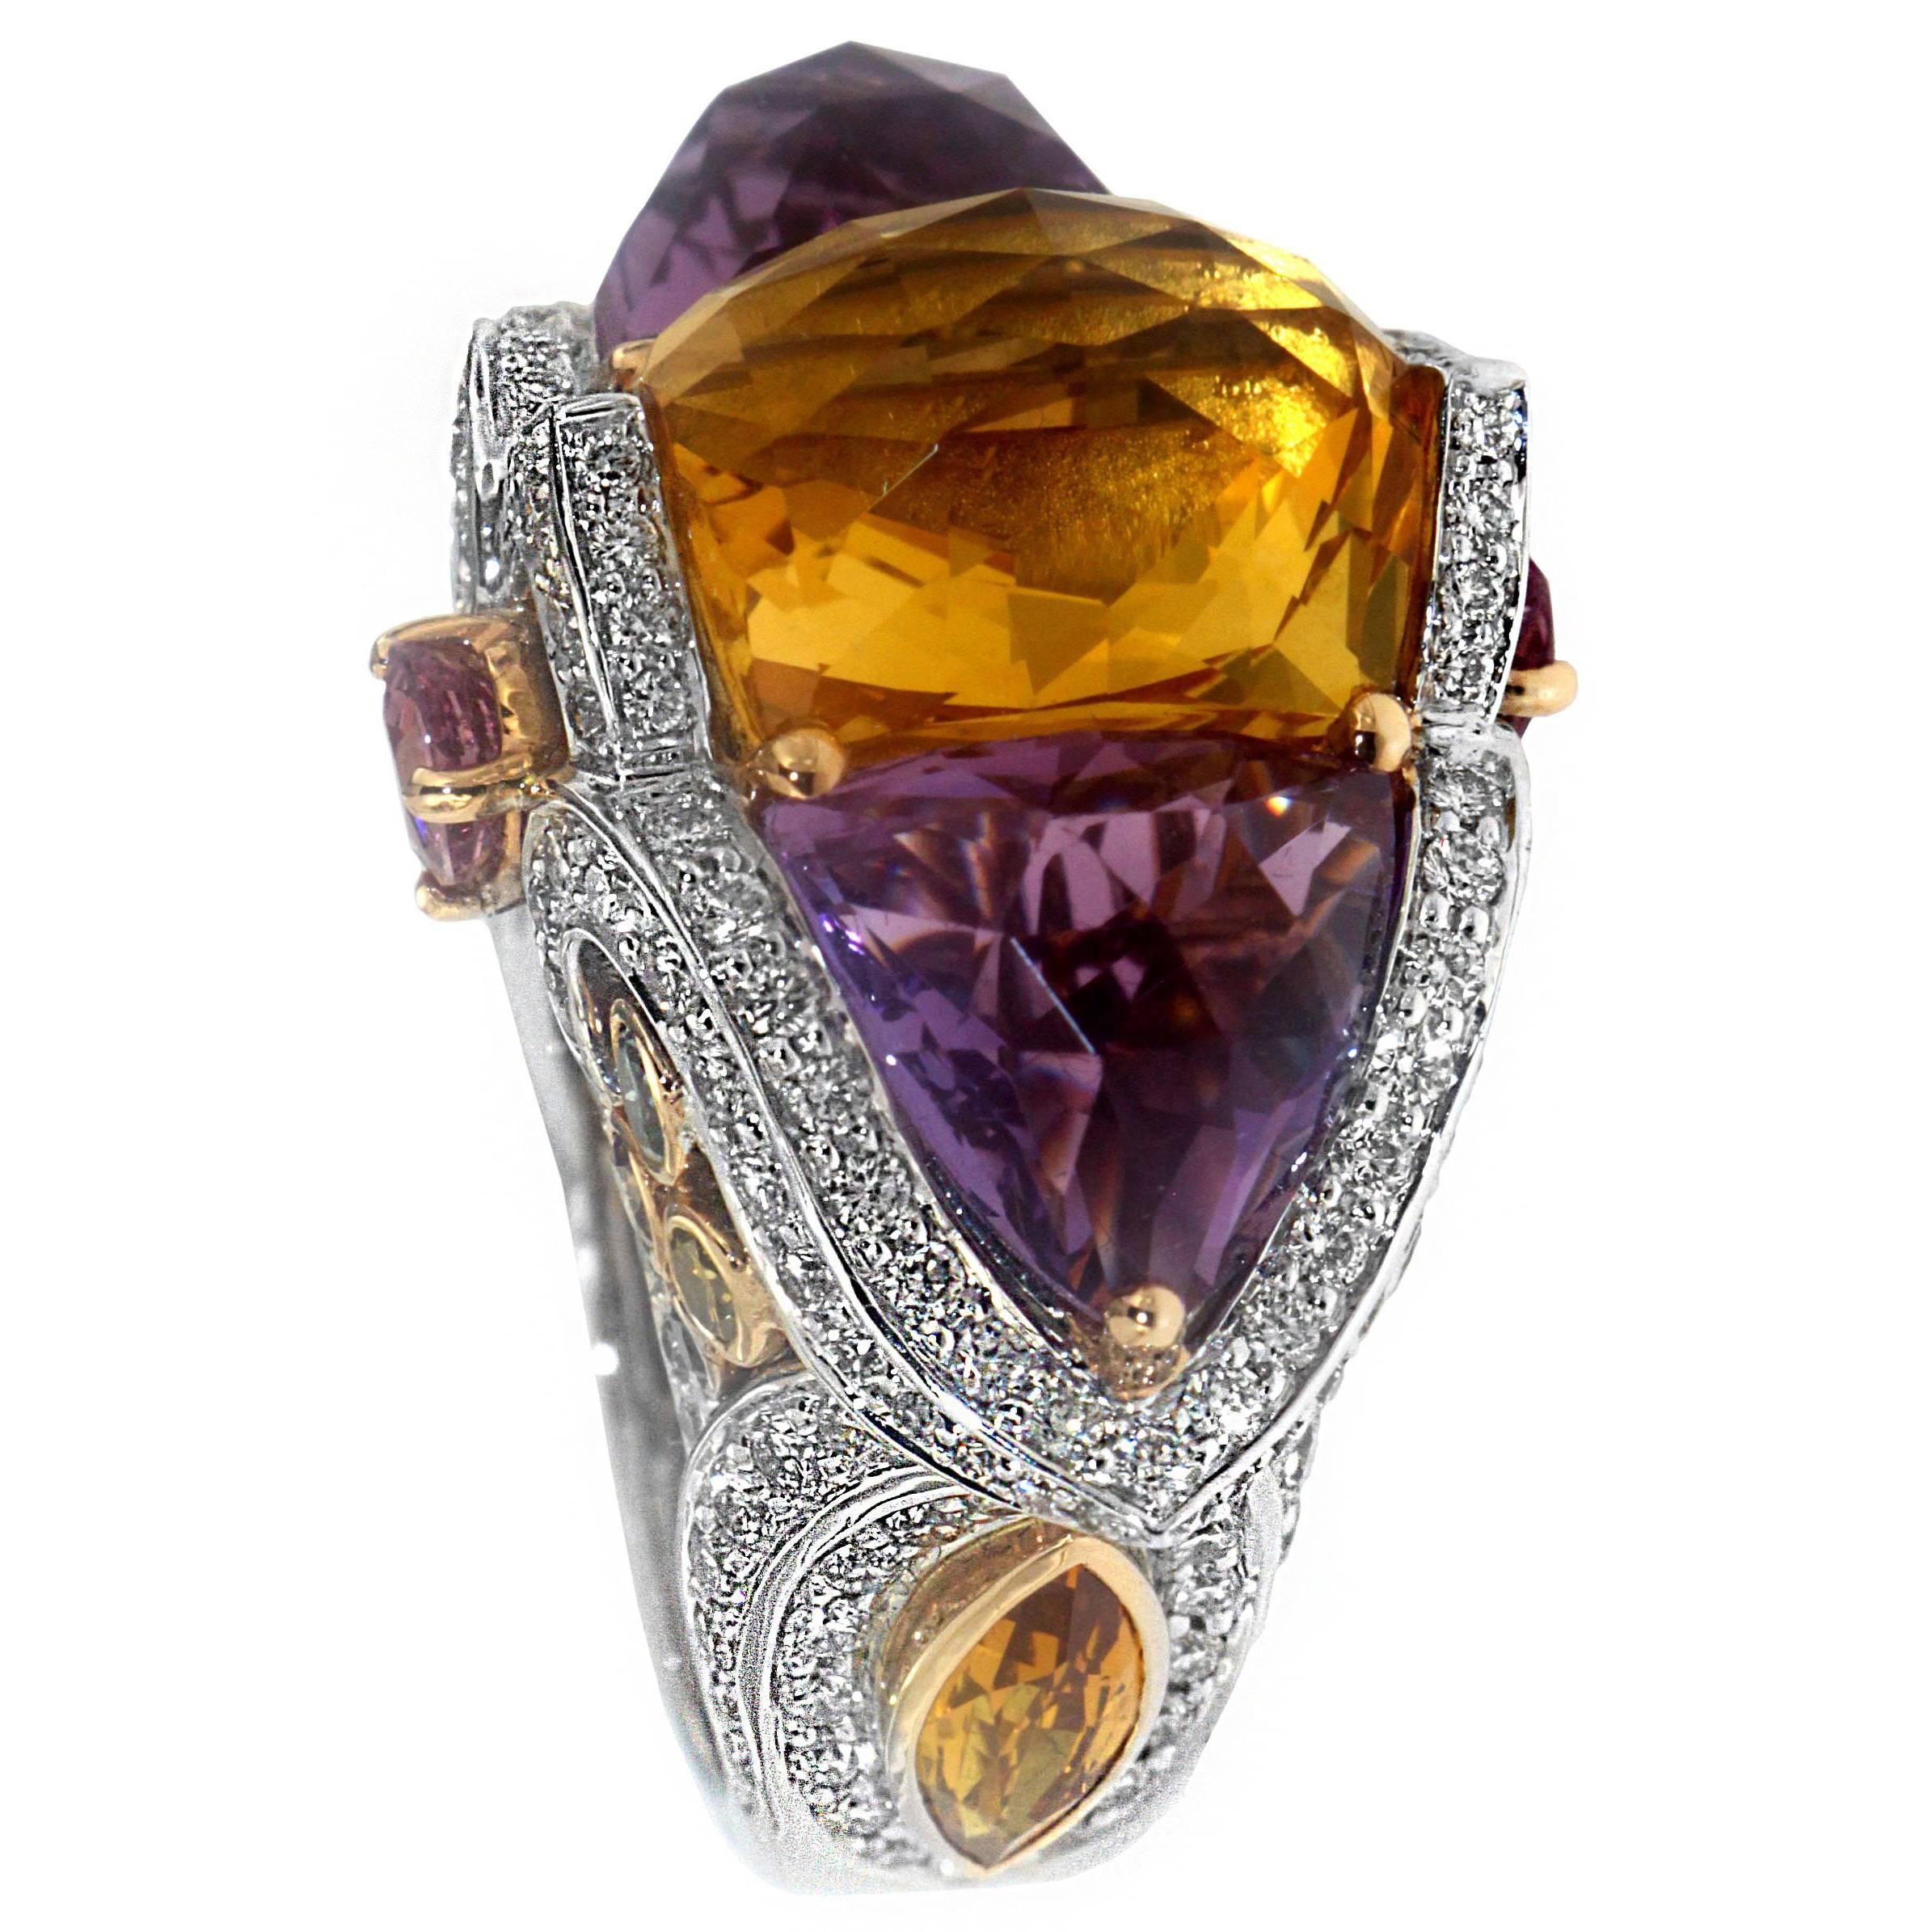 Zorab Creation Amethyst and Citrine Quartz Colored Diamond Sapphire Ring